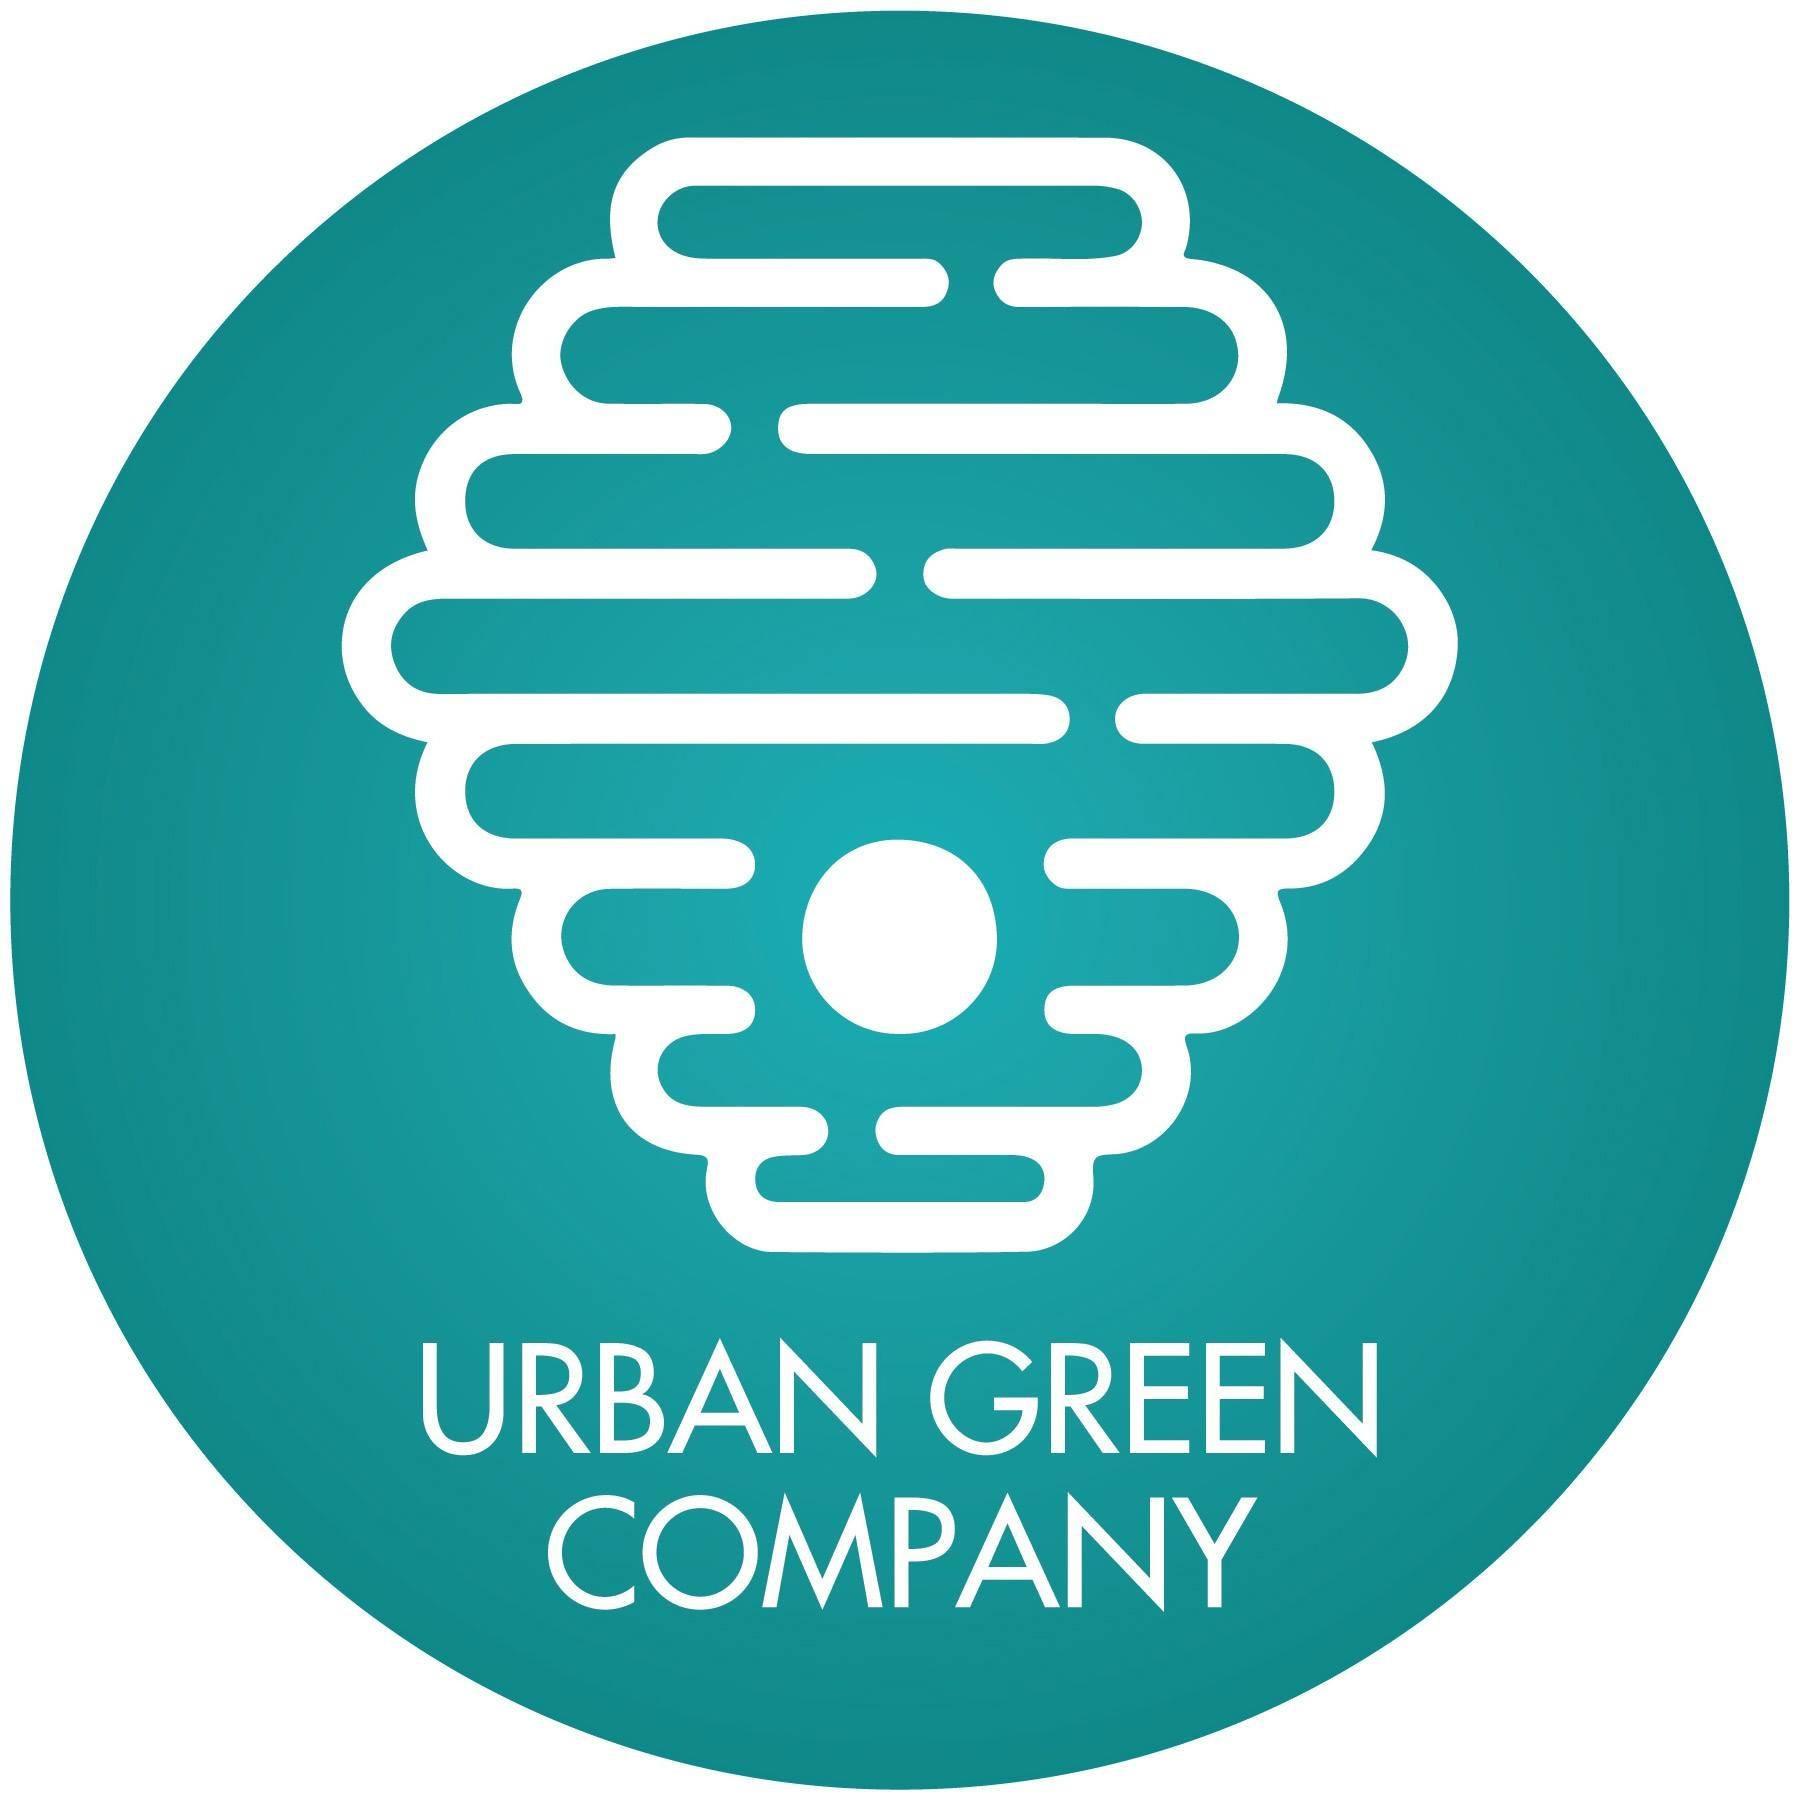 Urban Green Company